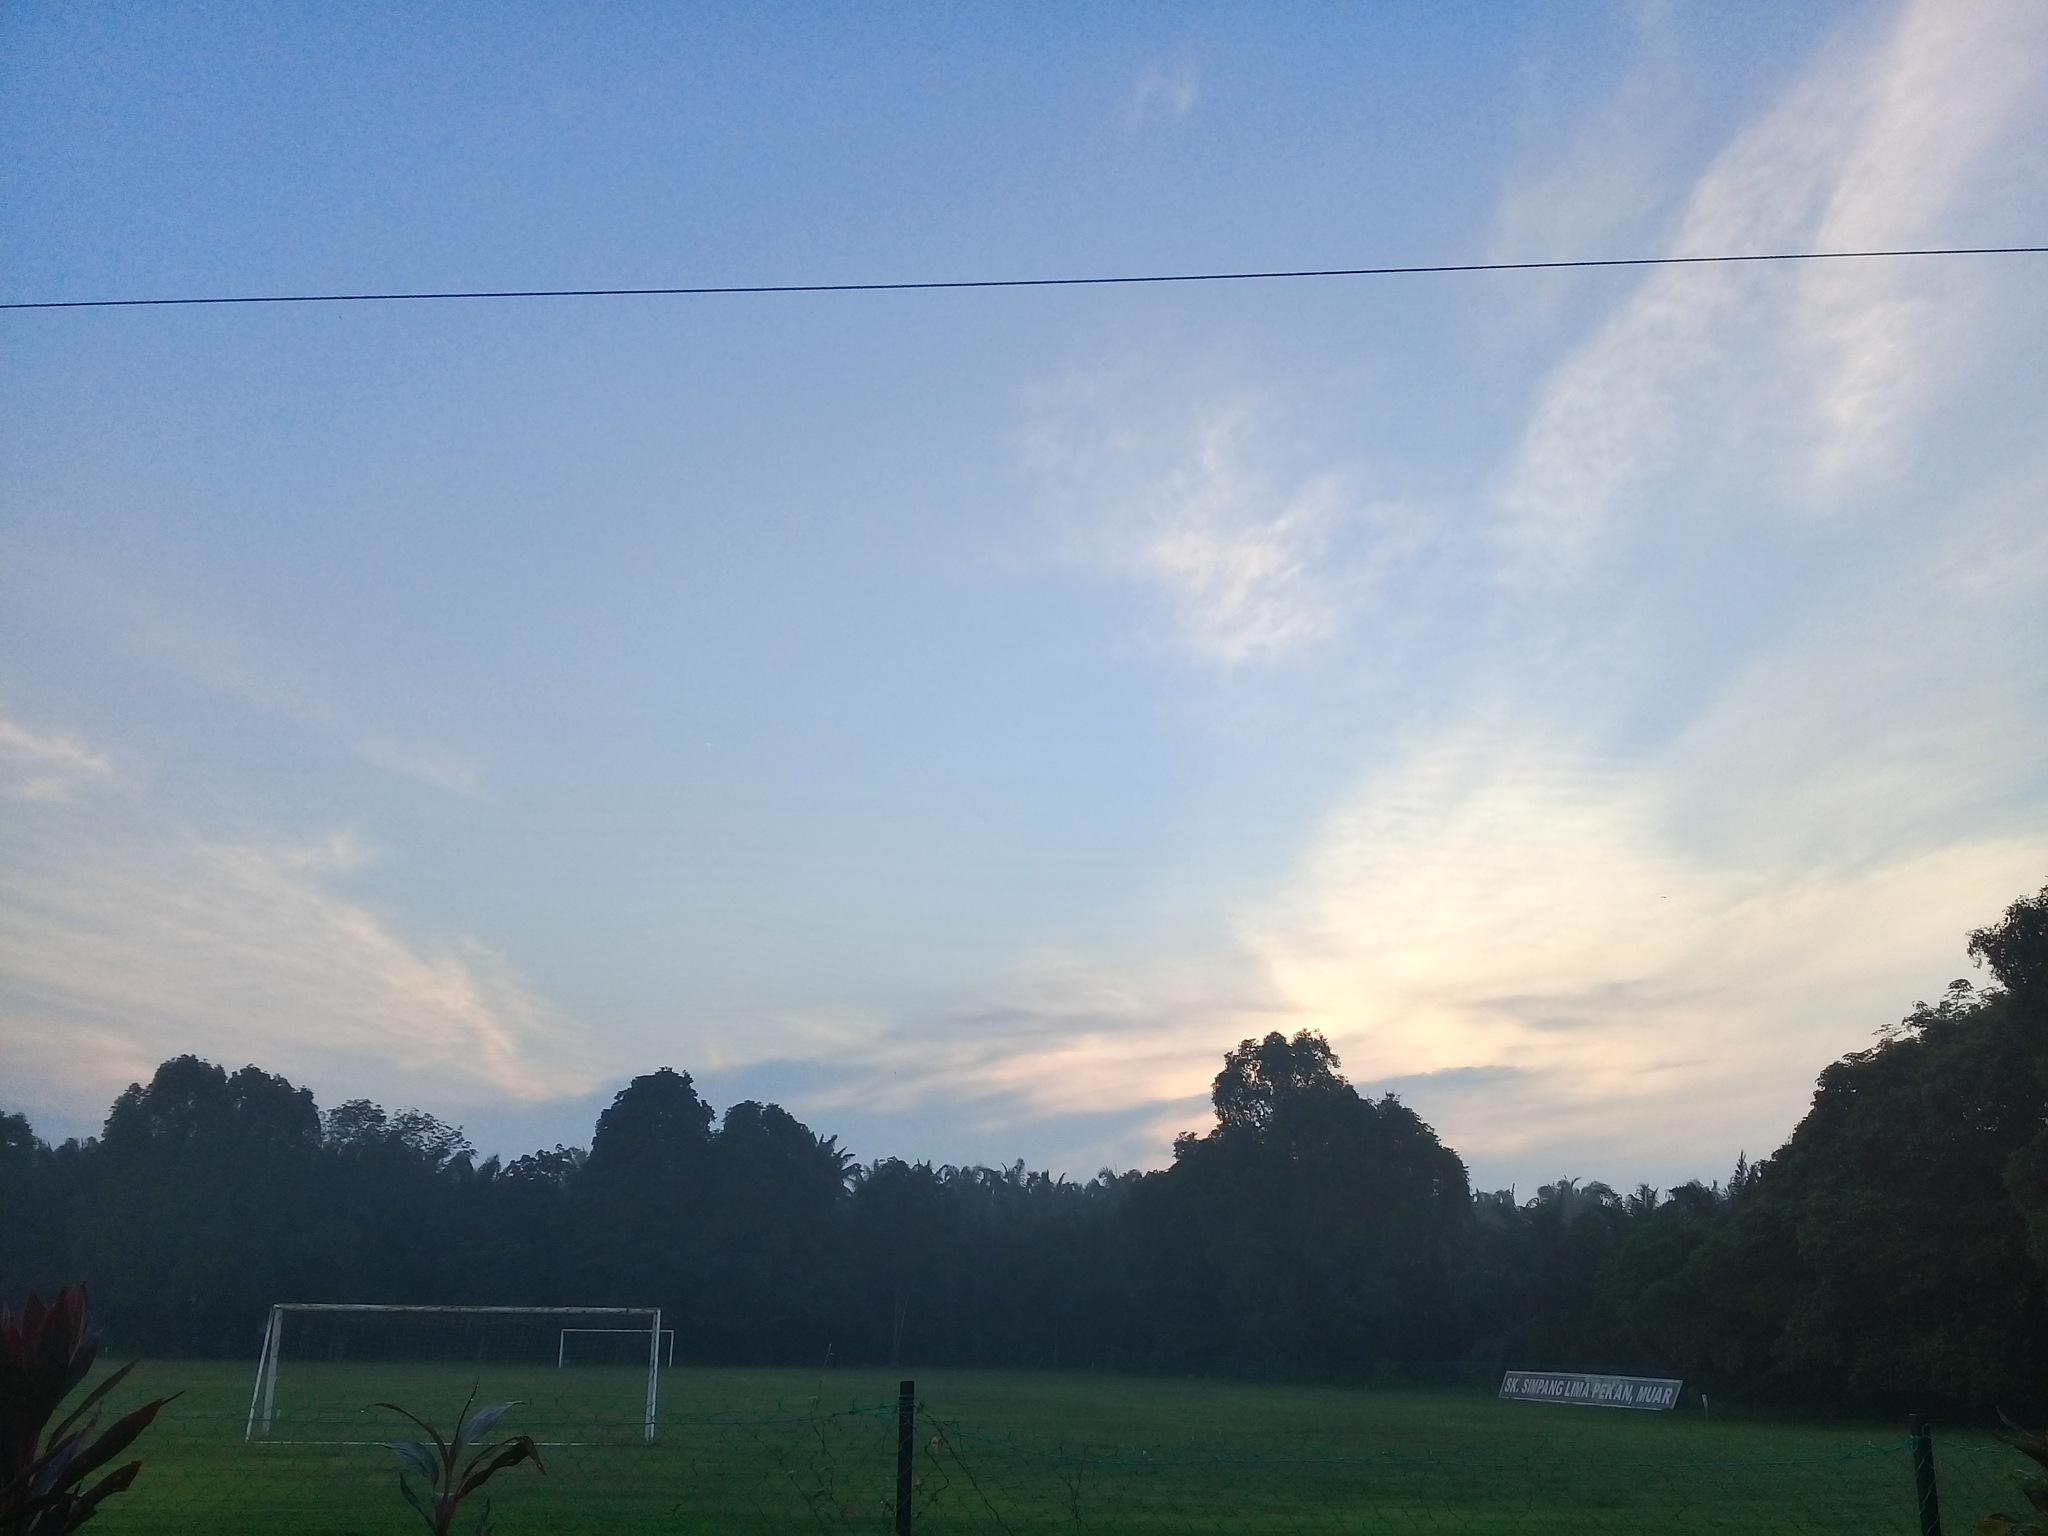 Hometown Sunrise by enmk26